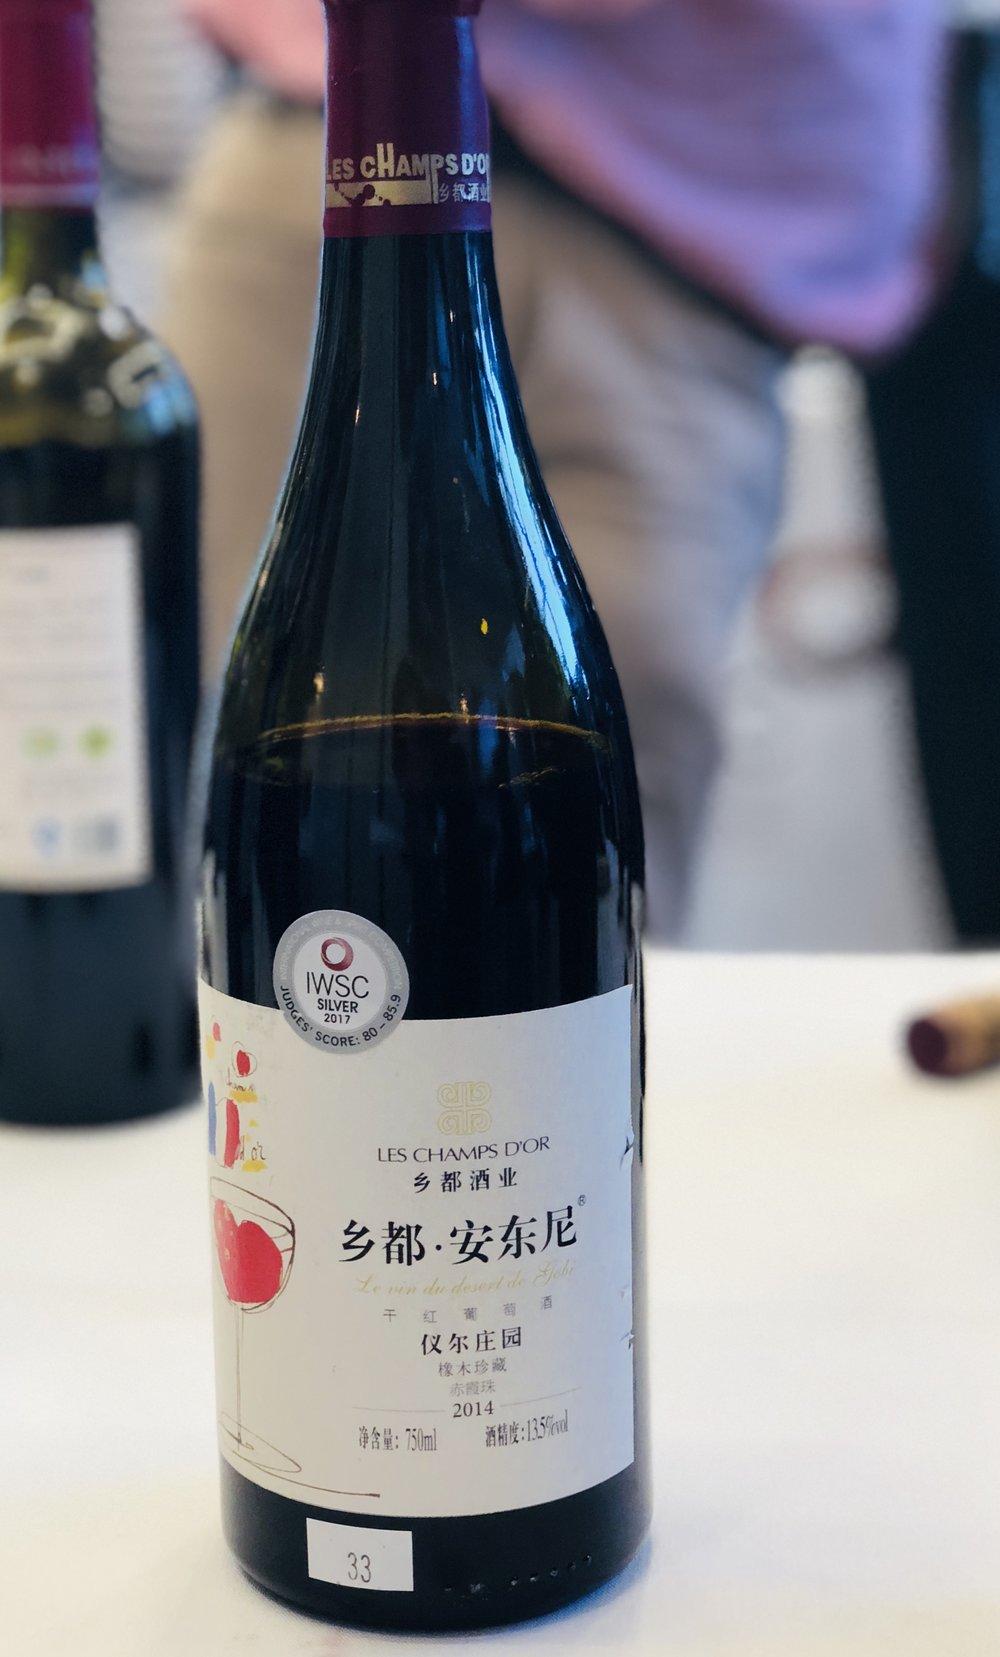 Le Champs D'or Cabernet Sauvignon 2014, Xinjiang Xinagdu Winery